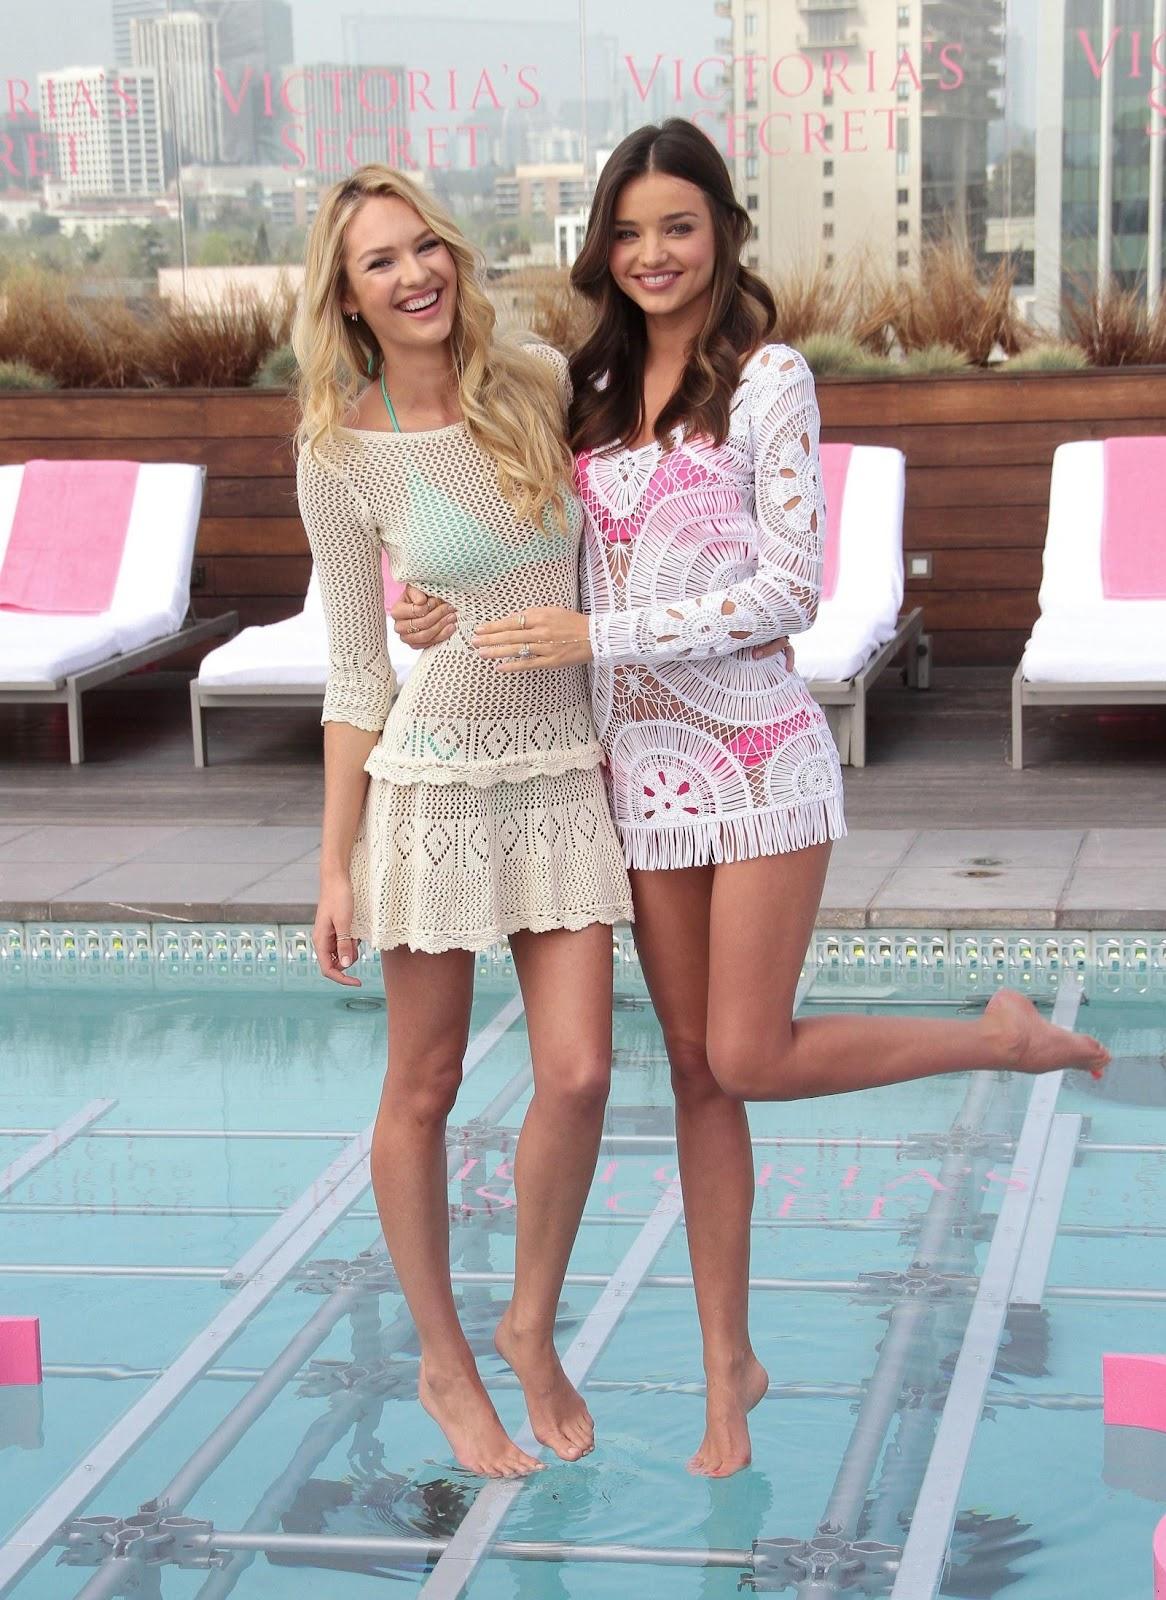 http://2.bp.blogspot.com/-YhYRFdXunVk/T3TLV8_y_uI/AAAAAAAAPs0/j6oGtGKG3Fk/s1600/Candice_SwanepoeL_Miranda_Kerr_angel_Victorias_Secret_swim_wallpapers+_03.jpg